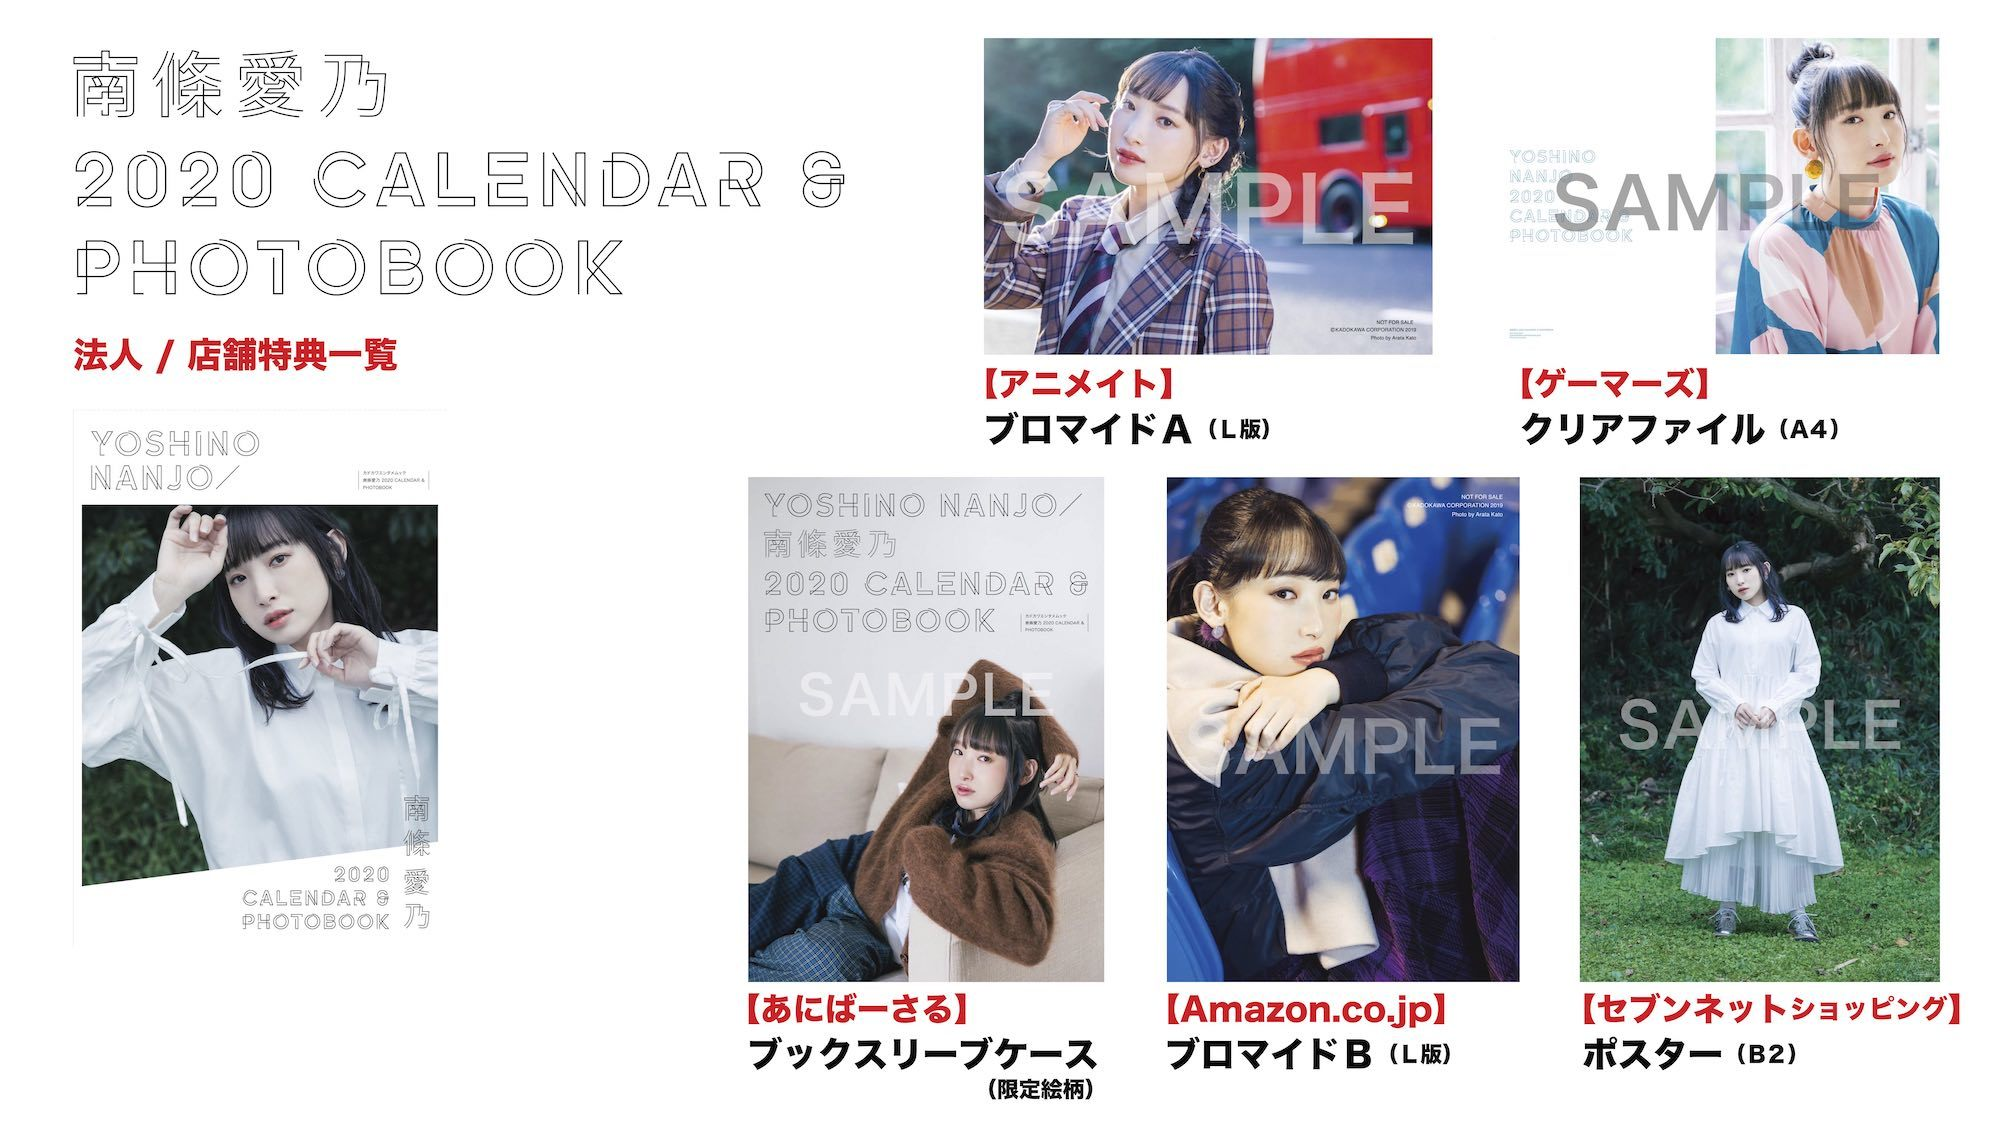 「南條愛乃 2020 CALENDAR & PHOTOBOOK」法人特典の一覧